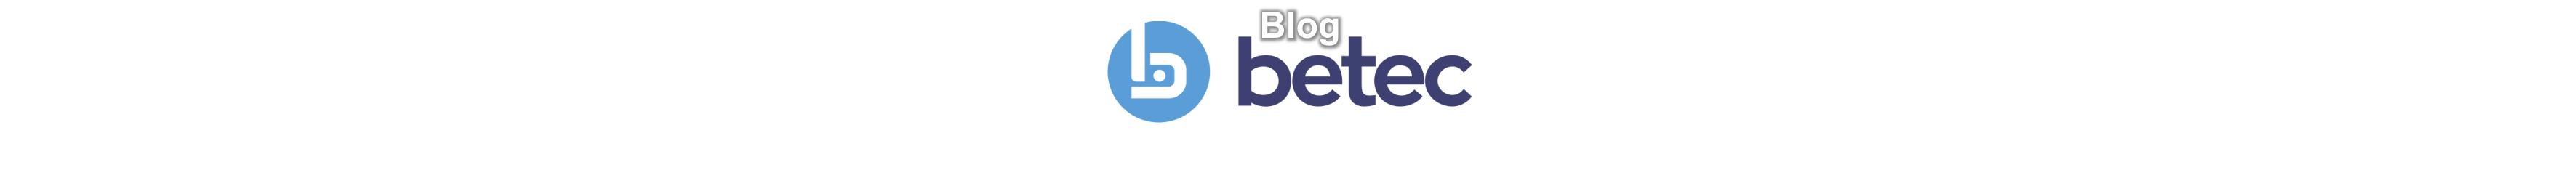 Blog Betec